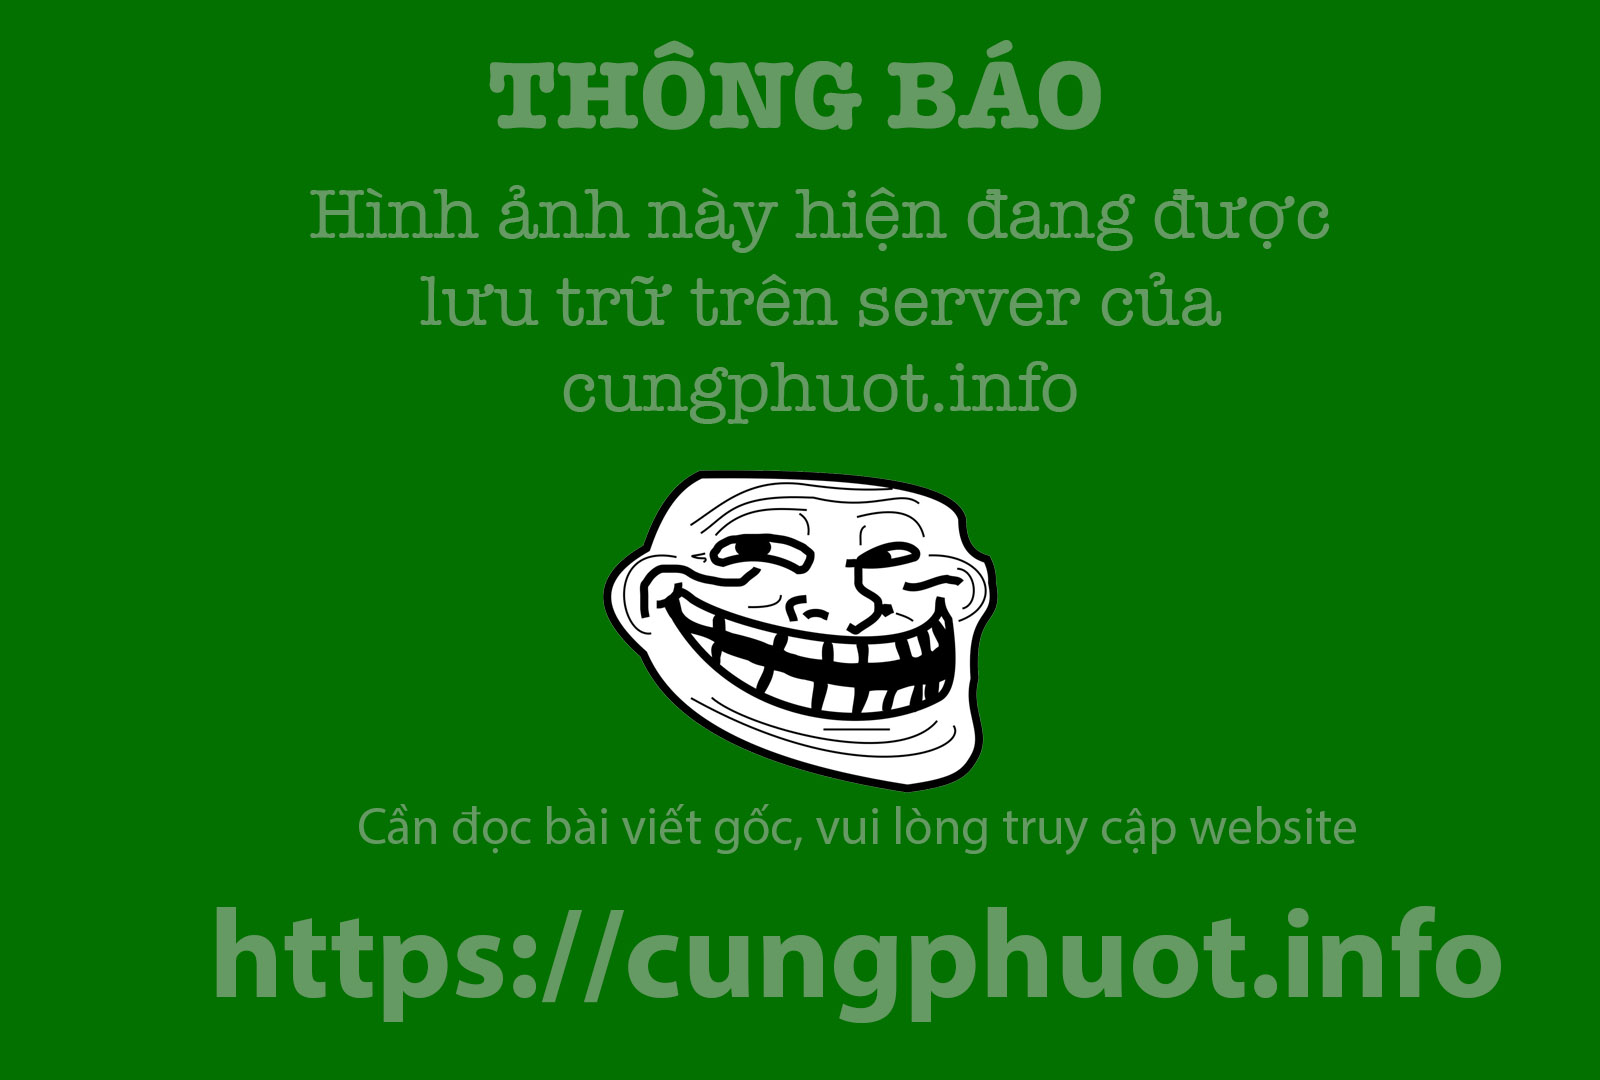 Chon bien cuong 'troi thap, dat cao' o Nam Can hinh anh 4